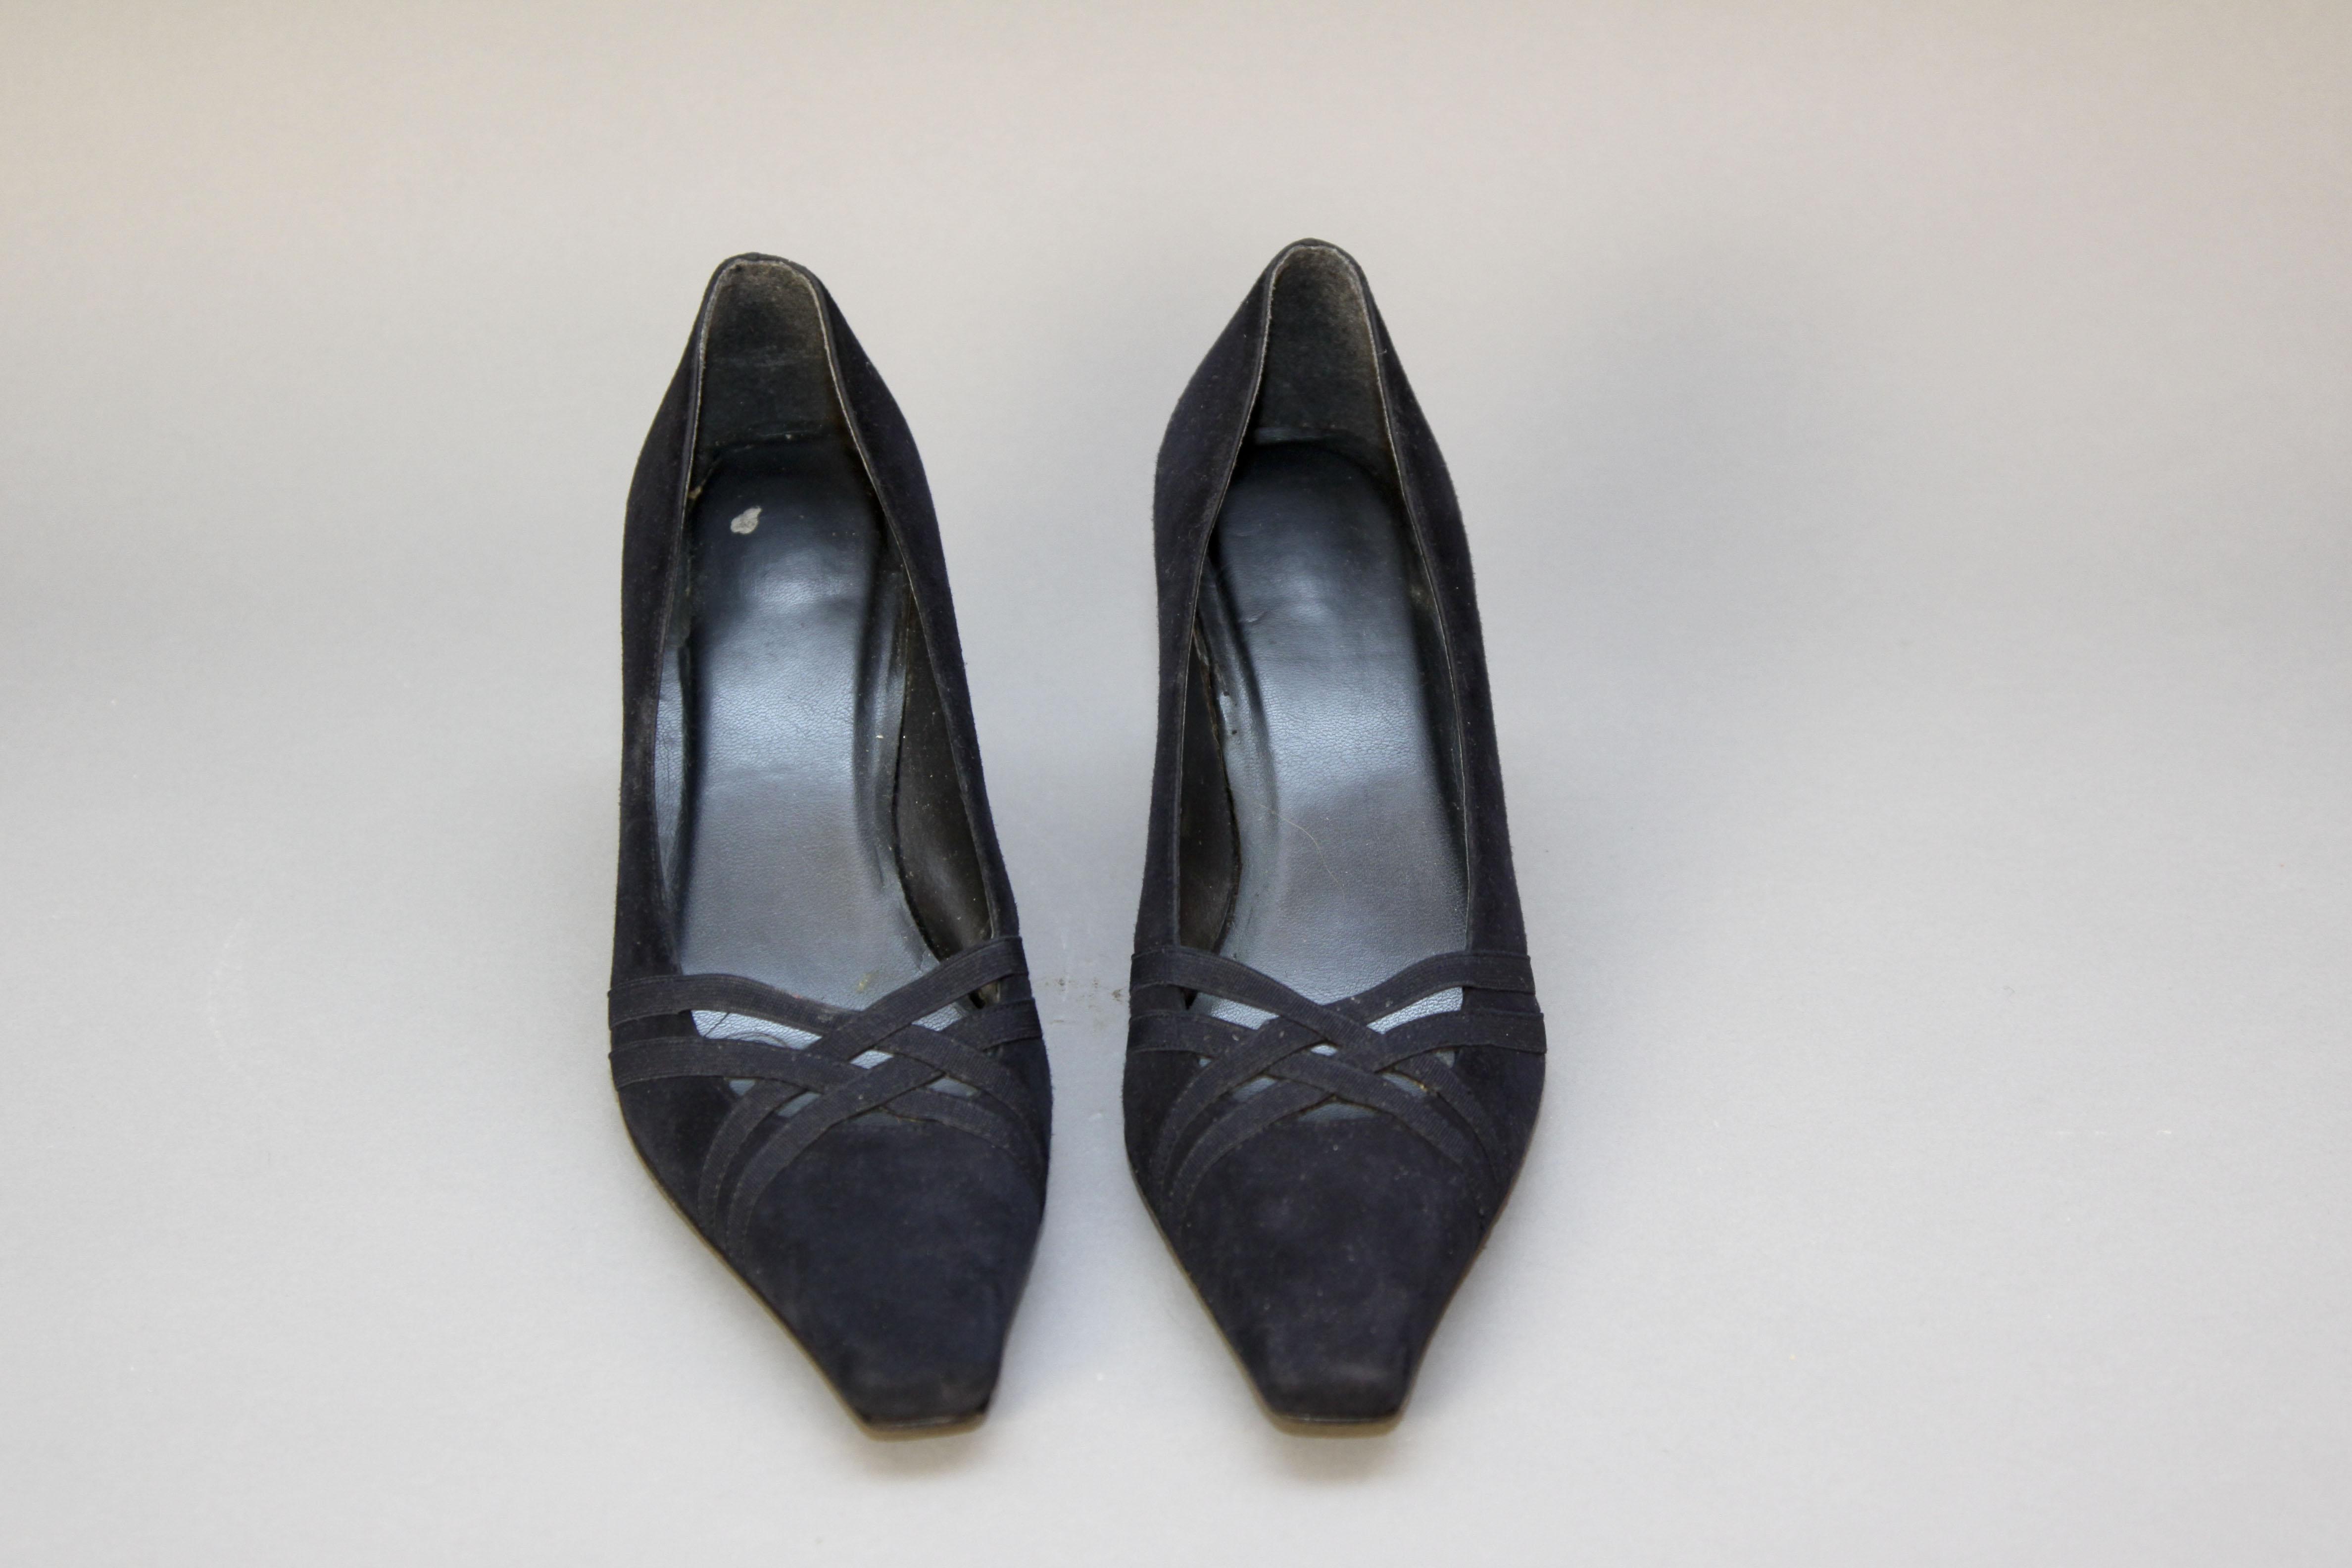 Women's Stuart Weitzman Navy Shoes Size